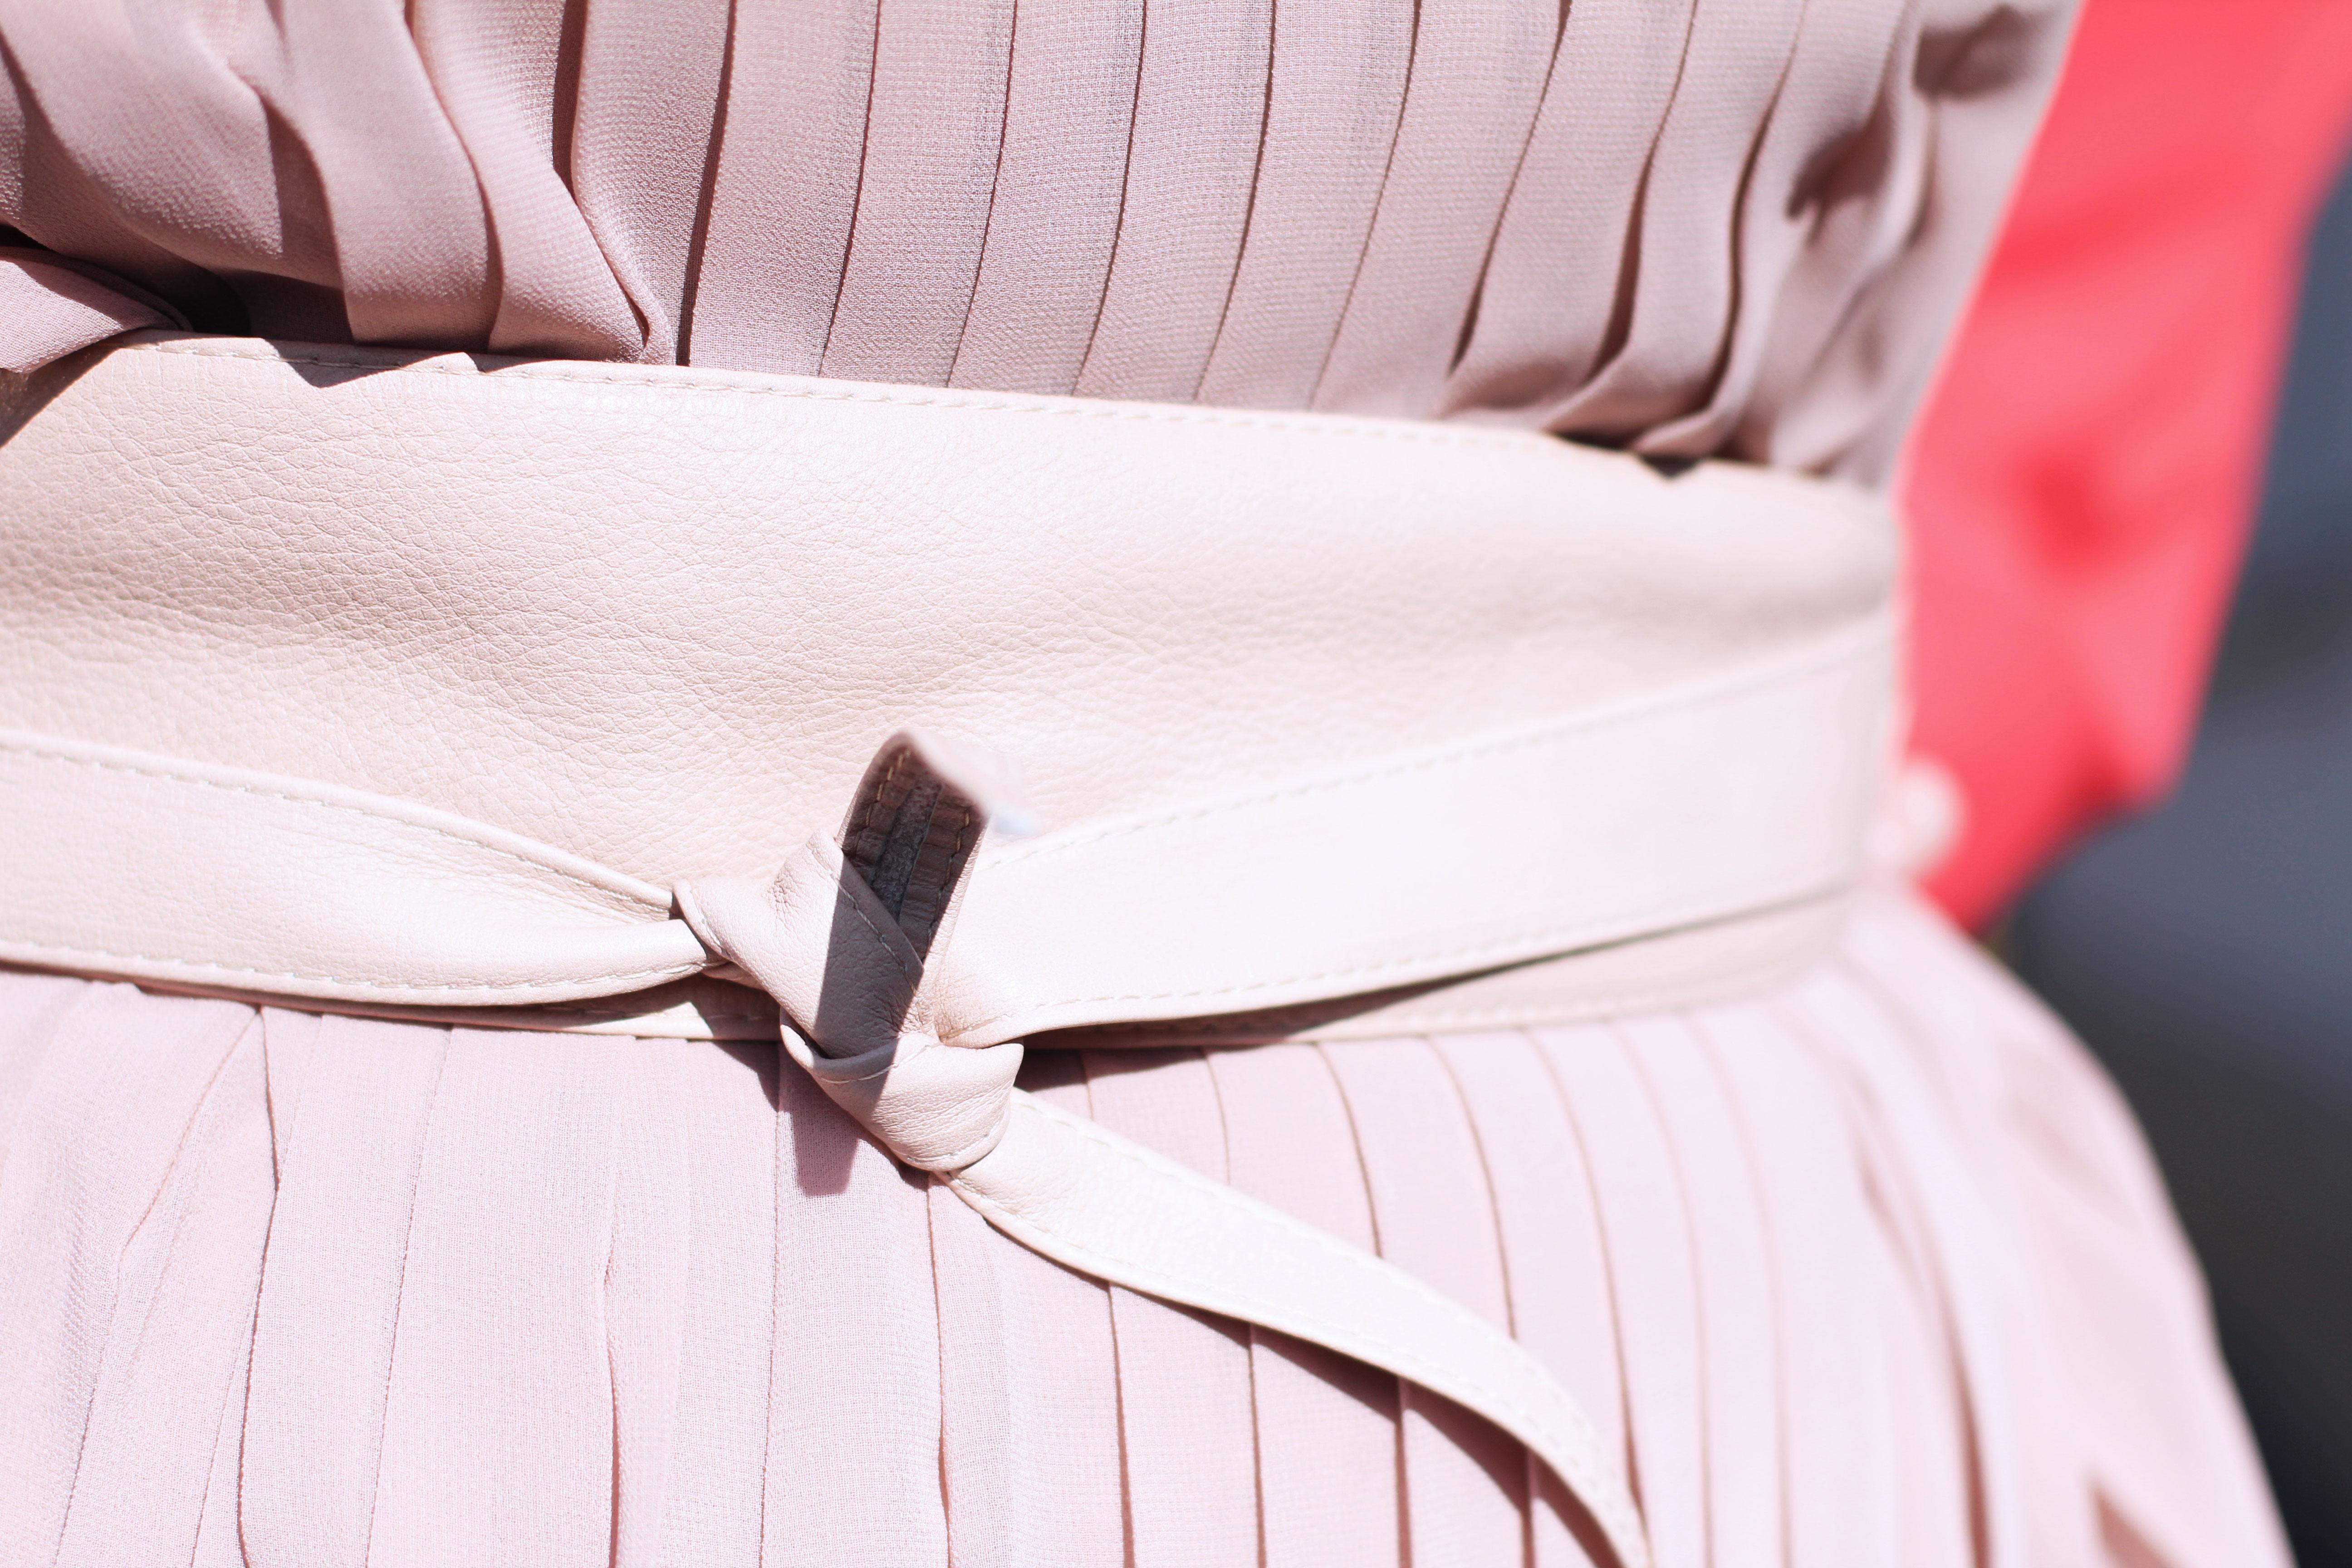 Volant-Metallic-Silber-Plissee-Kleid-Koralle-Trenchcoat-Grandios-Vienna-Plus-Size-Outfit-Look-Spring-Fashion-kardiaserena-Gürtel-Accessoire